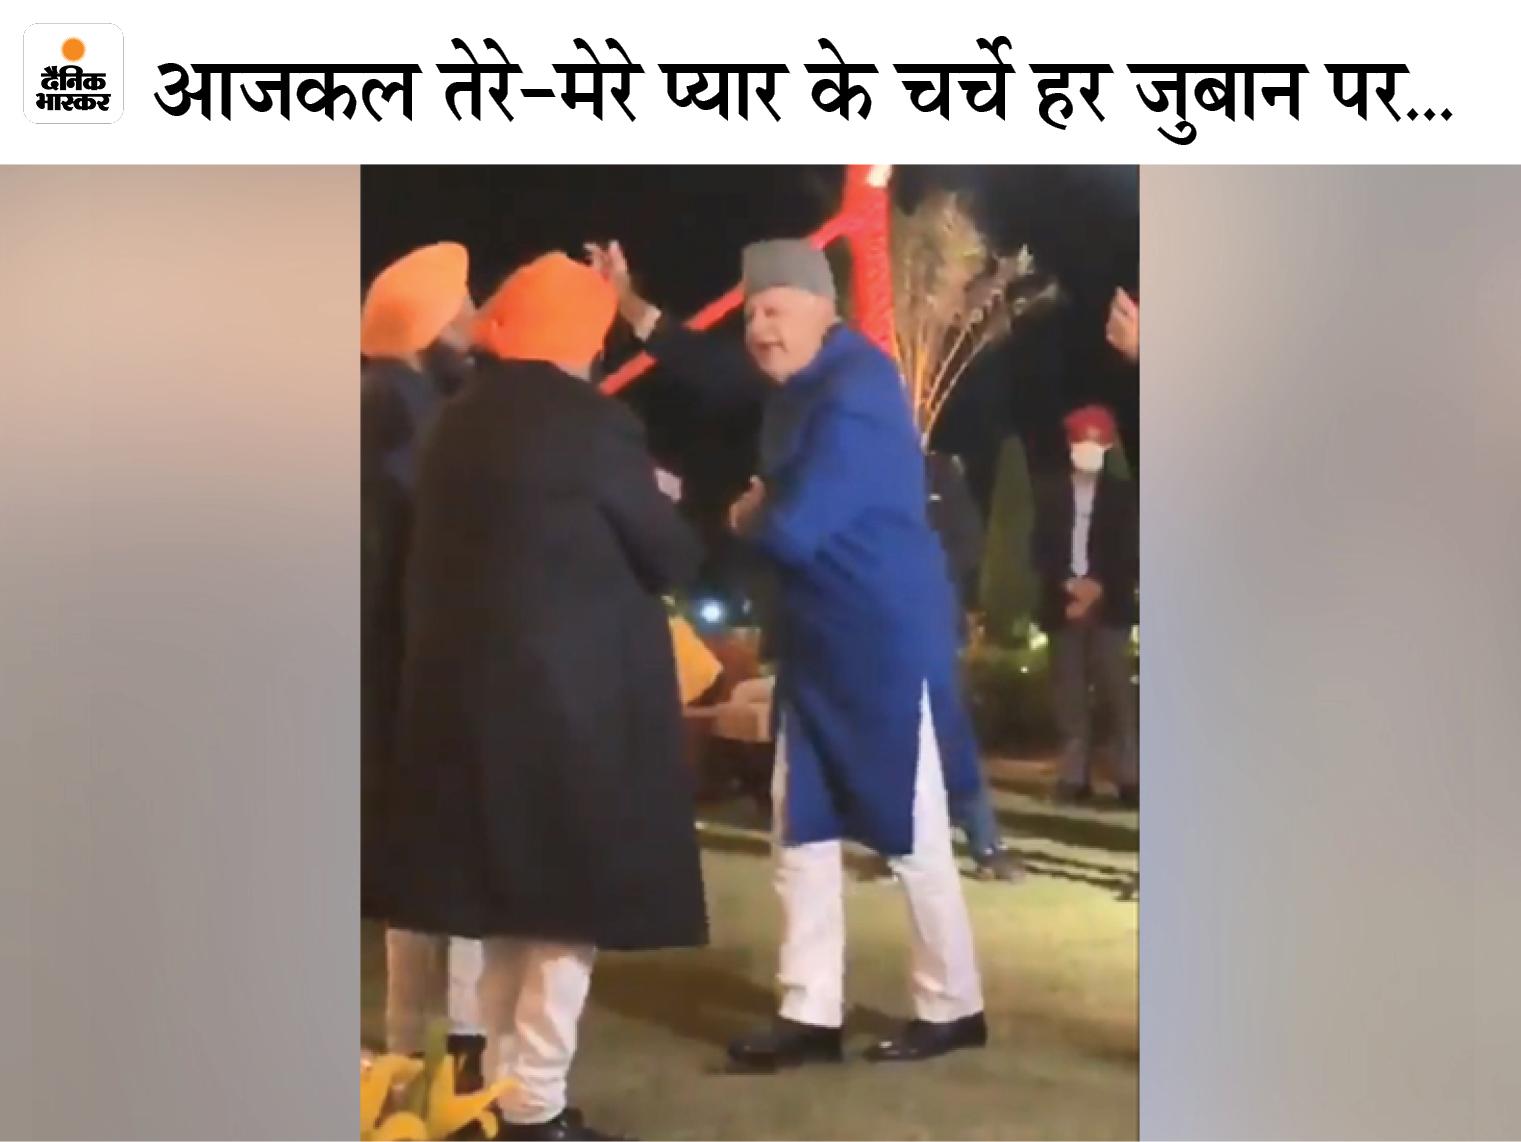 Farooq Abdullah dancing at Capt Amarinder Singh's granddaughter's wedding news and updates | गुलाबी आंखे जो तेरी देखीं गाने पर जमकर नाचे फारूक, डांस करते-करते अमरिंदर को भी खींच लिया